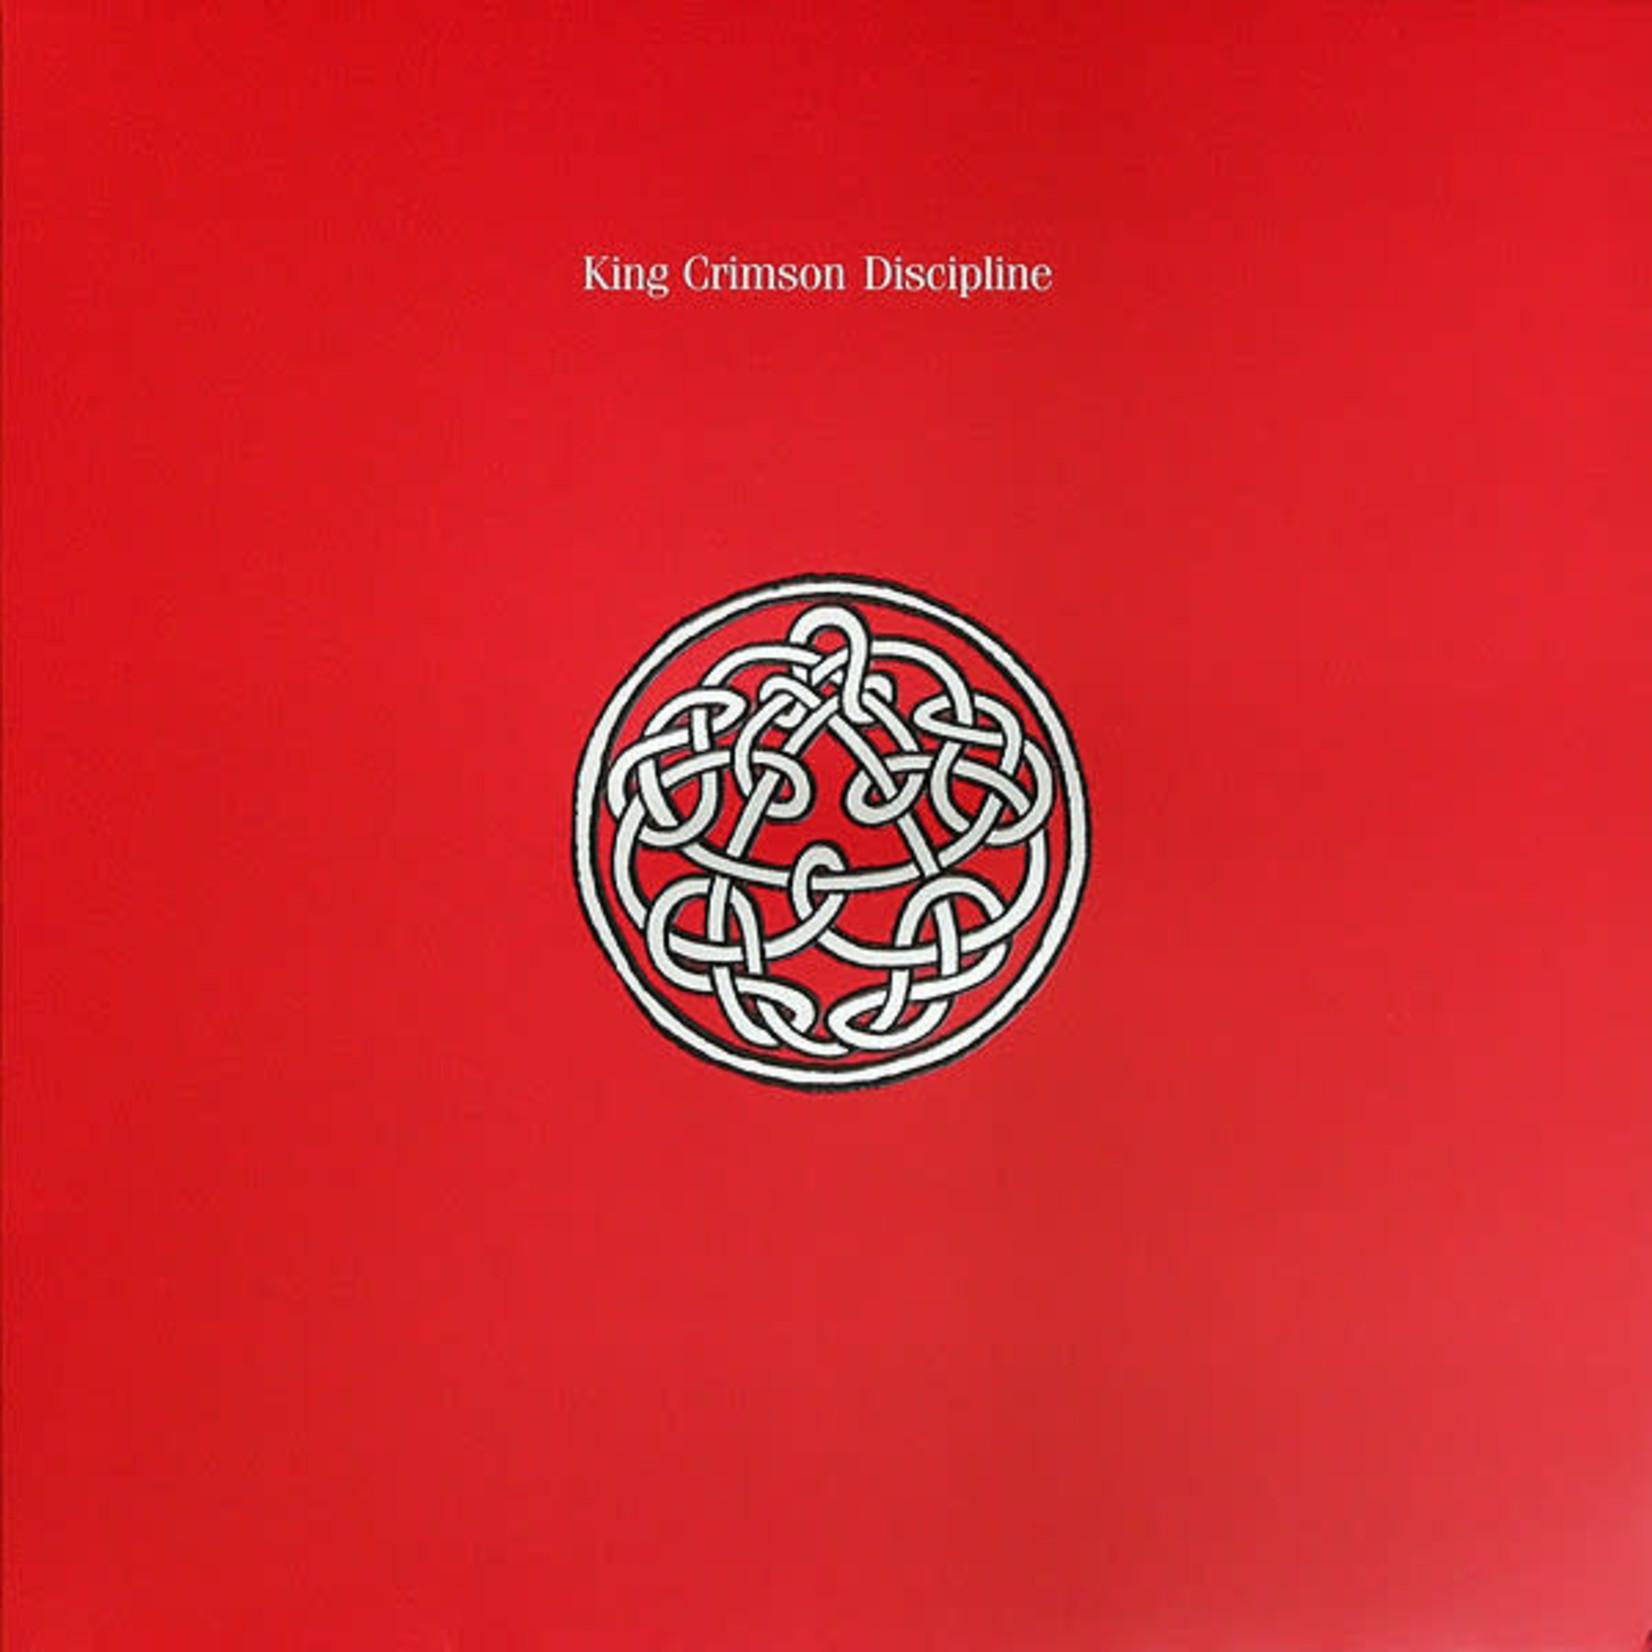 [New] King Crimson: Discipline